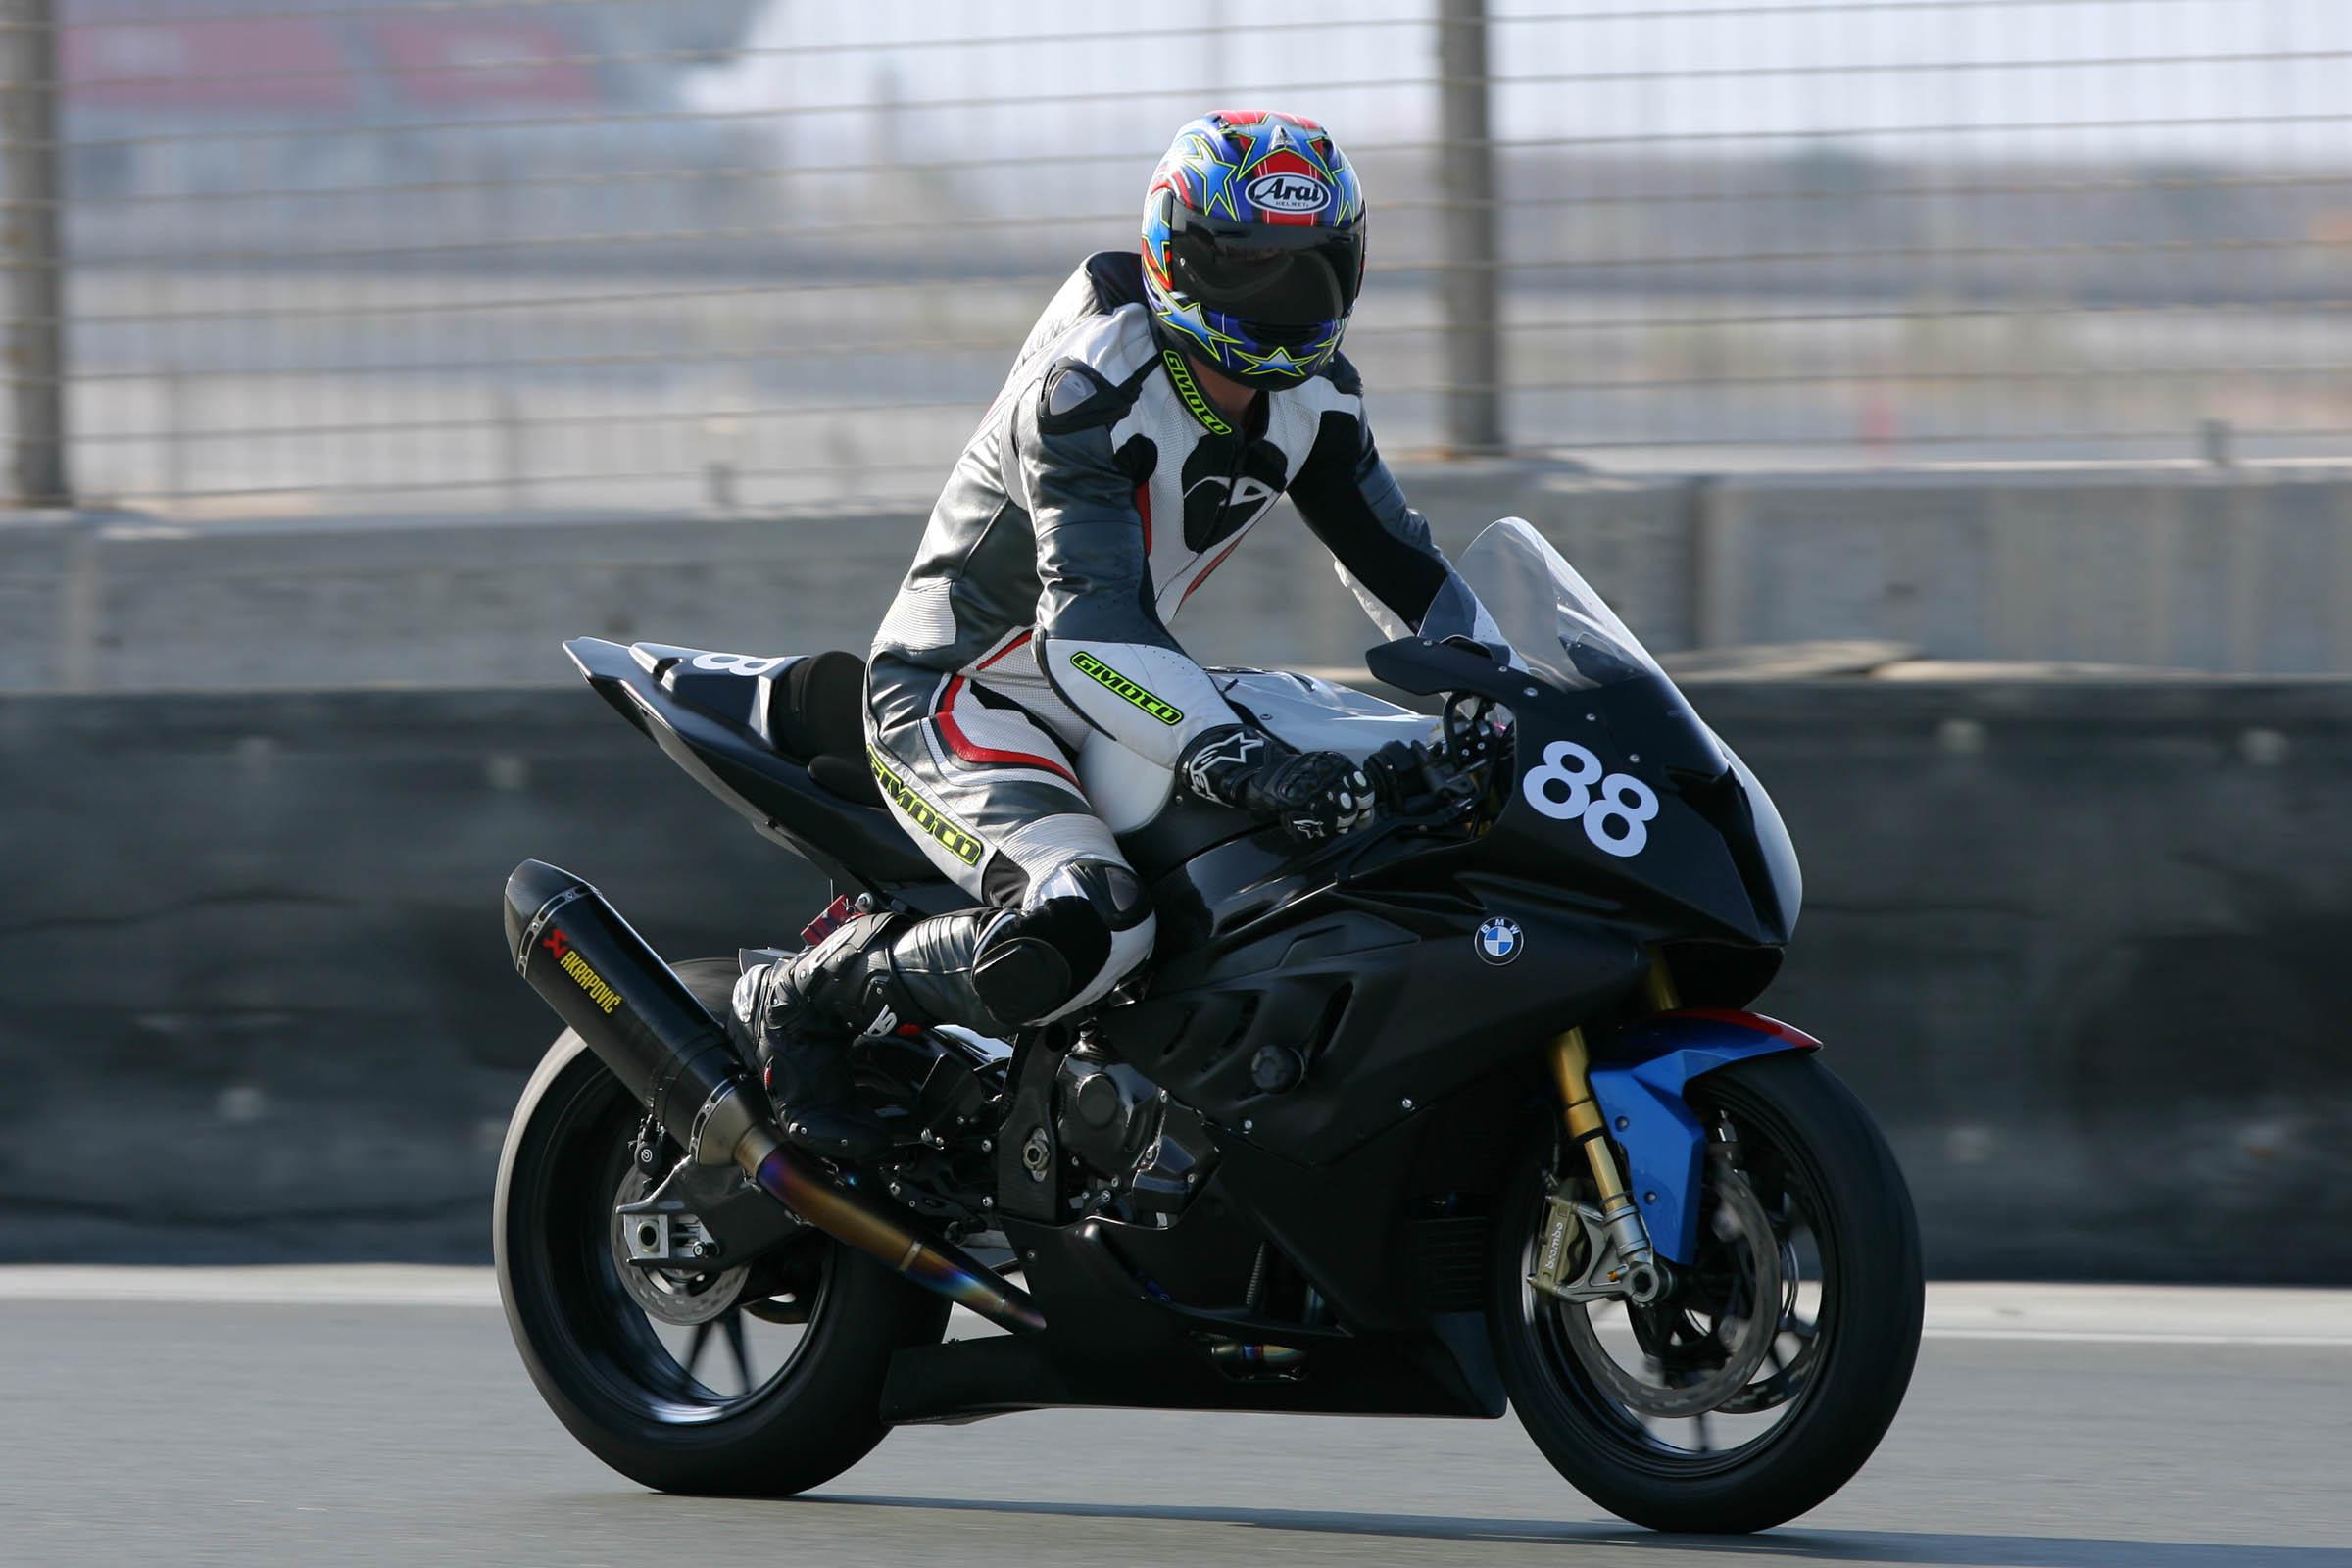 UAE National Racing: Big weekend for UAE Sportscars and UAE Sportbikes at Dubai Autodrome